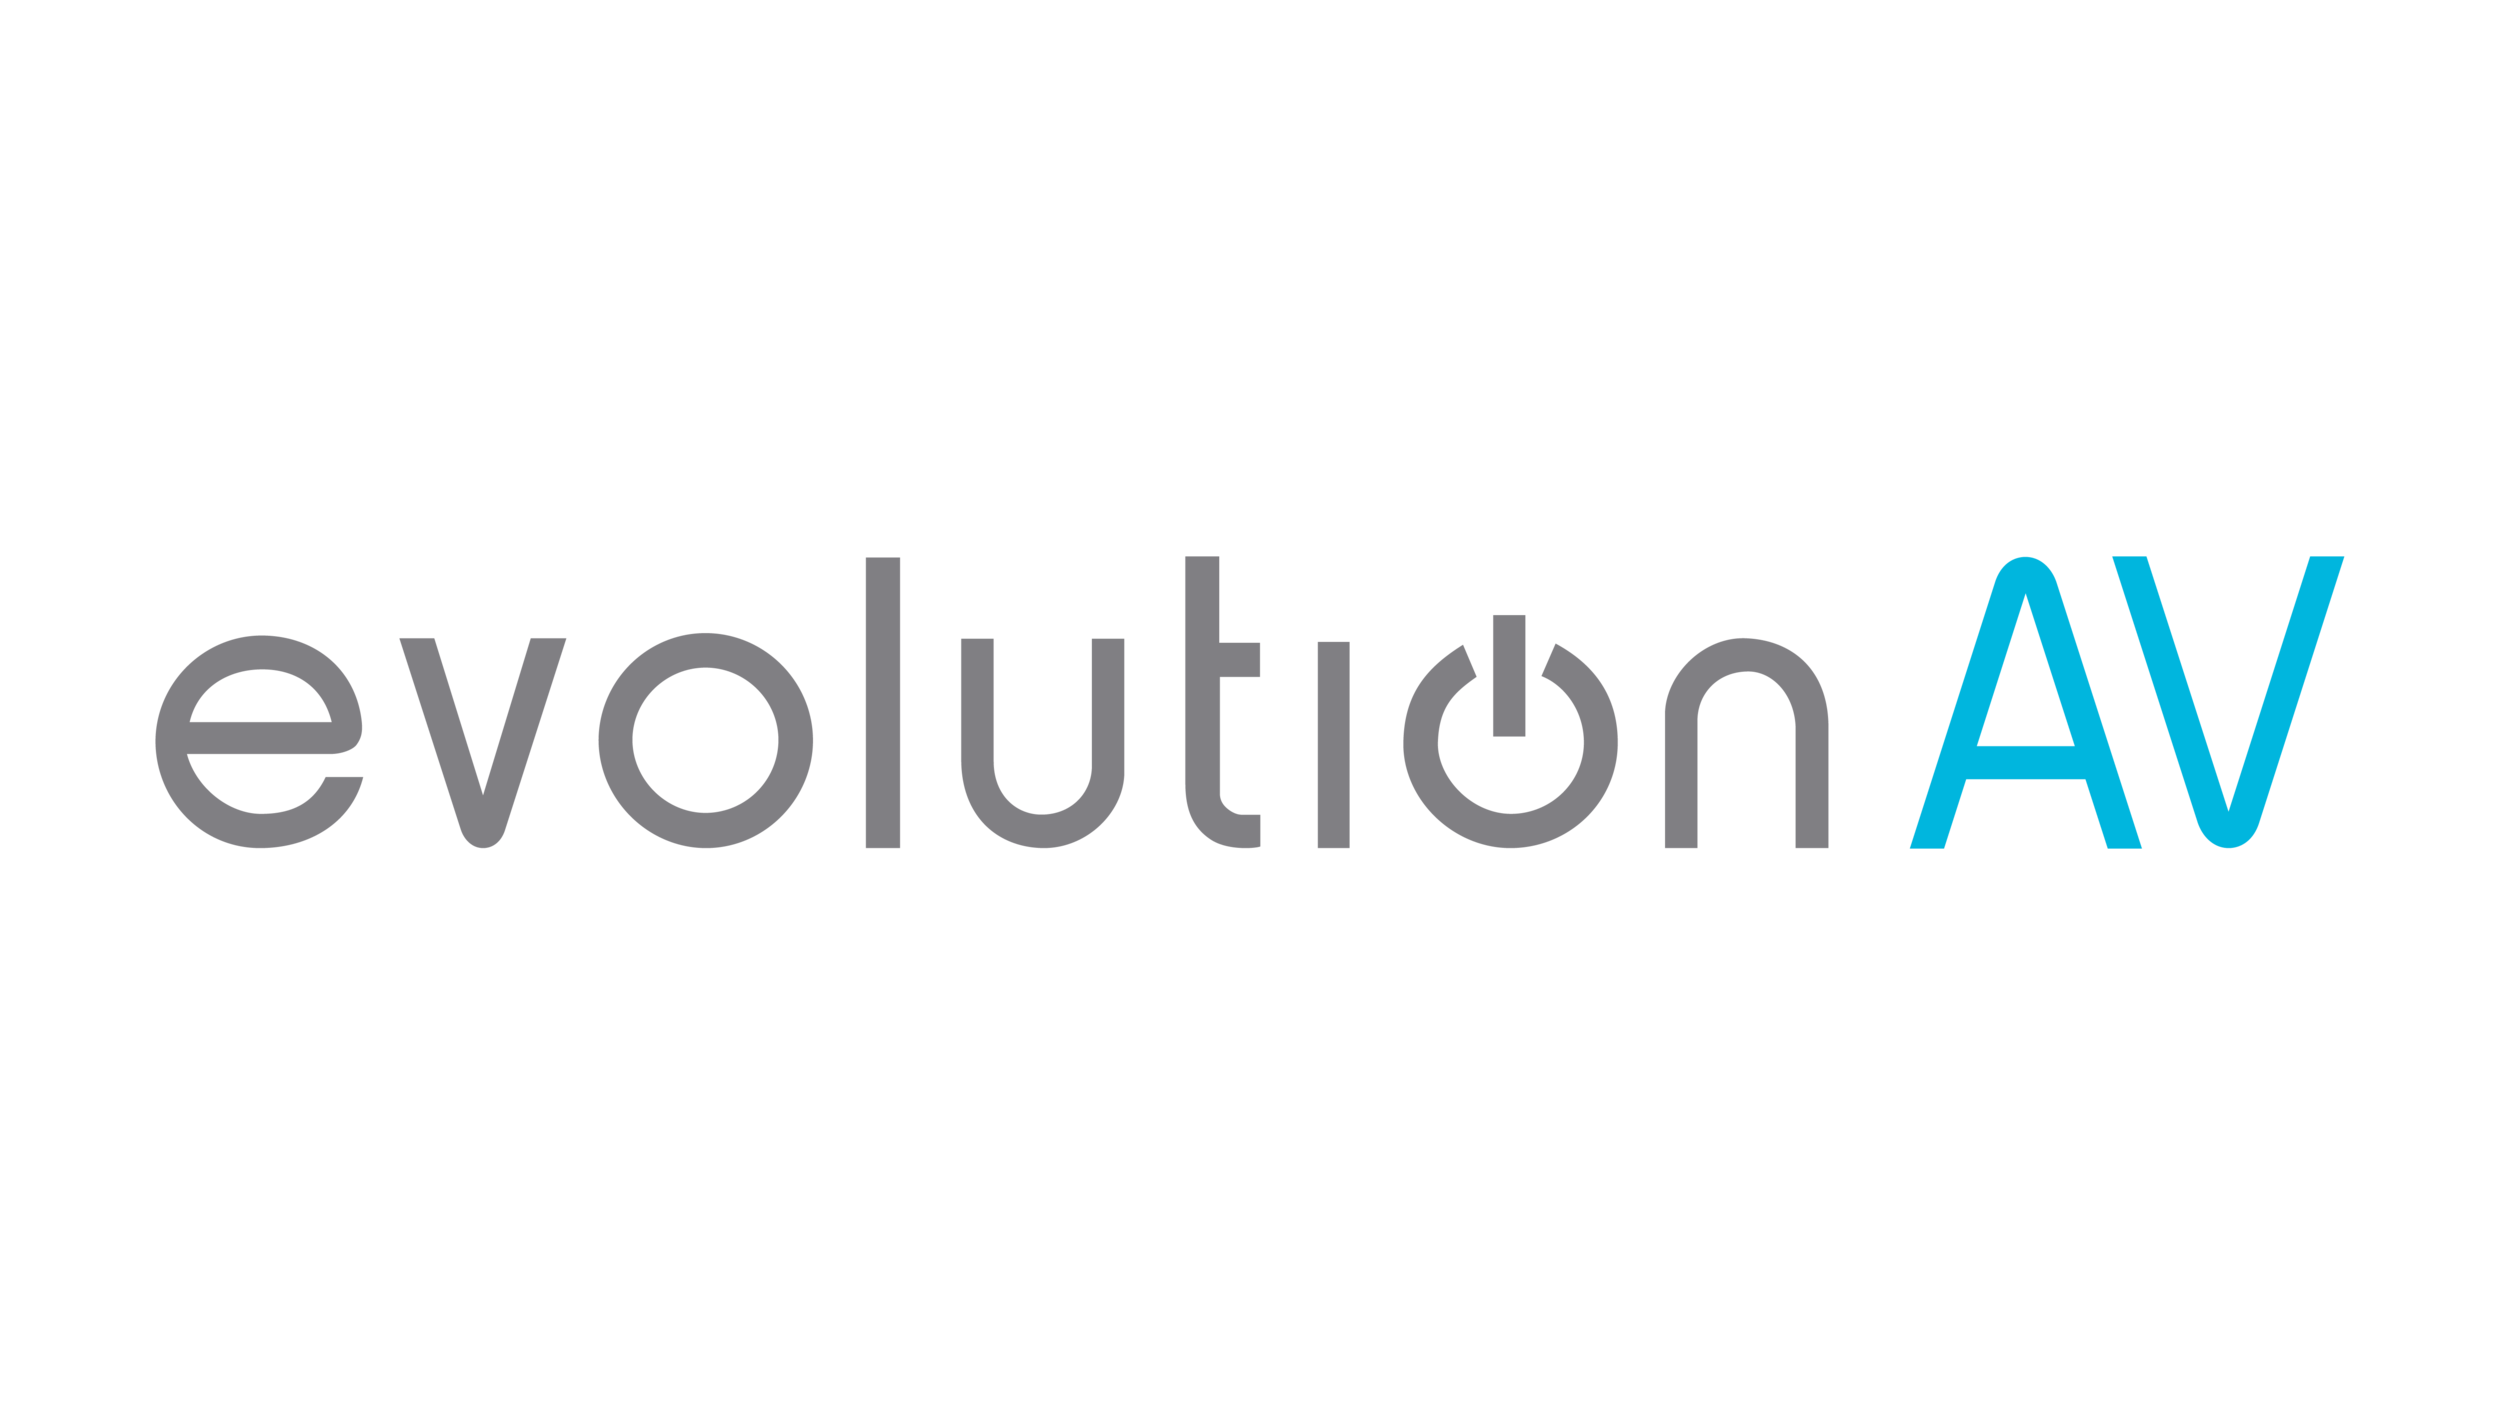 evolutionAV_Logo_GREYBLUE-01.png